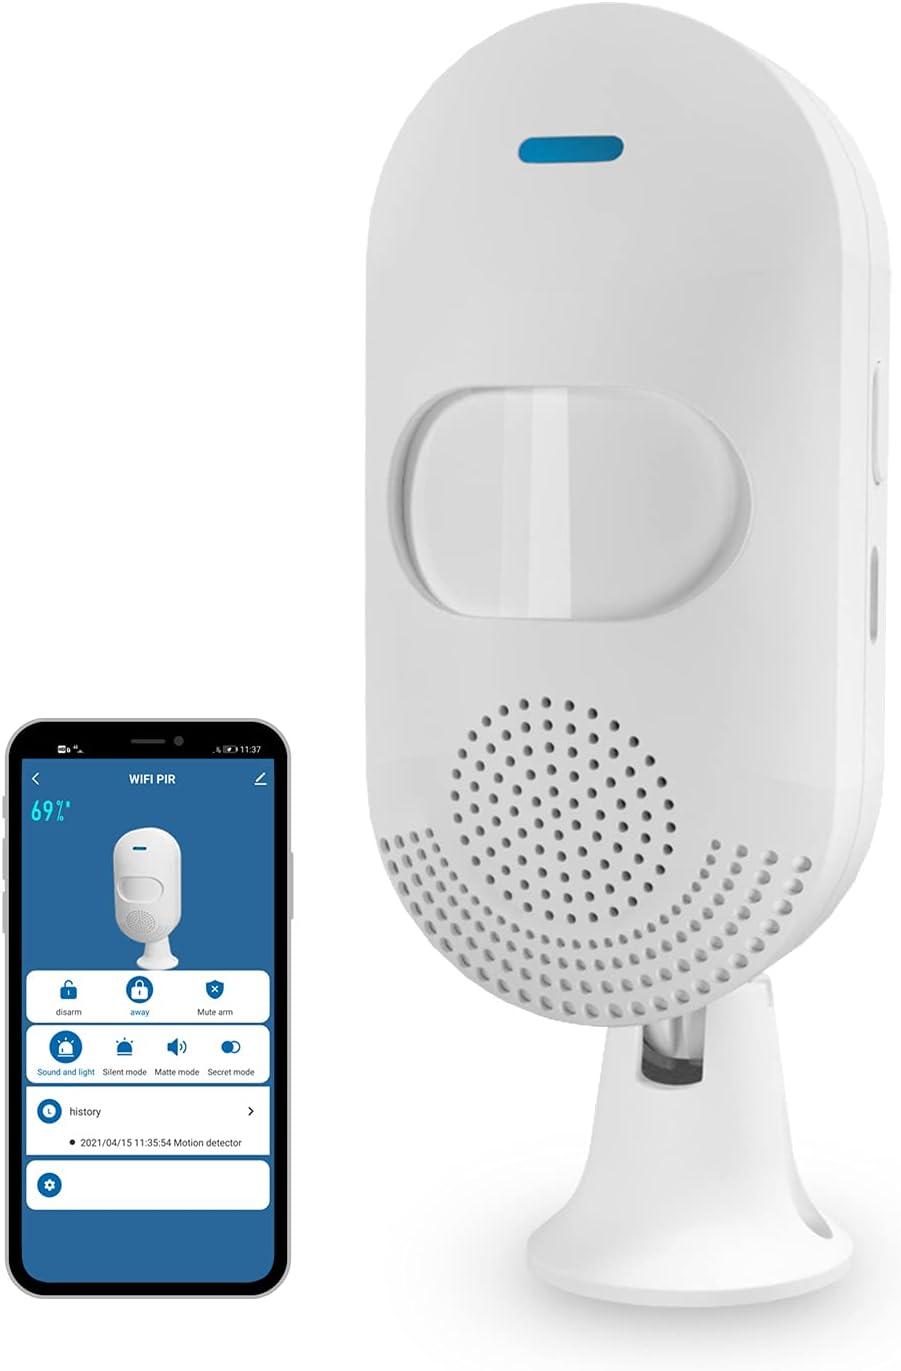 WiFi Super beauty product Lowest price challenge restock quality top Smart Motion Sensor Alarm Indoor PIR Feelink Infrared Detec